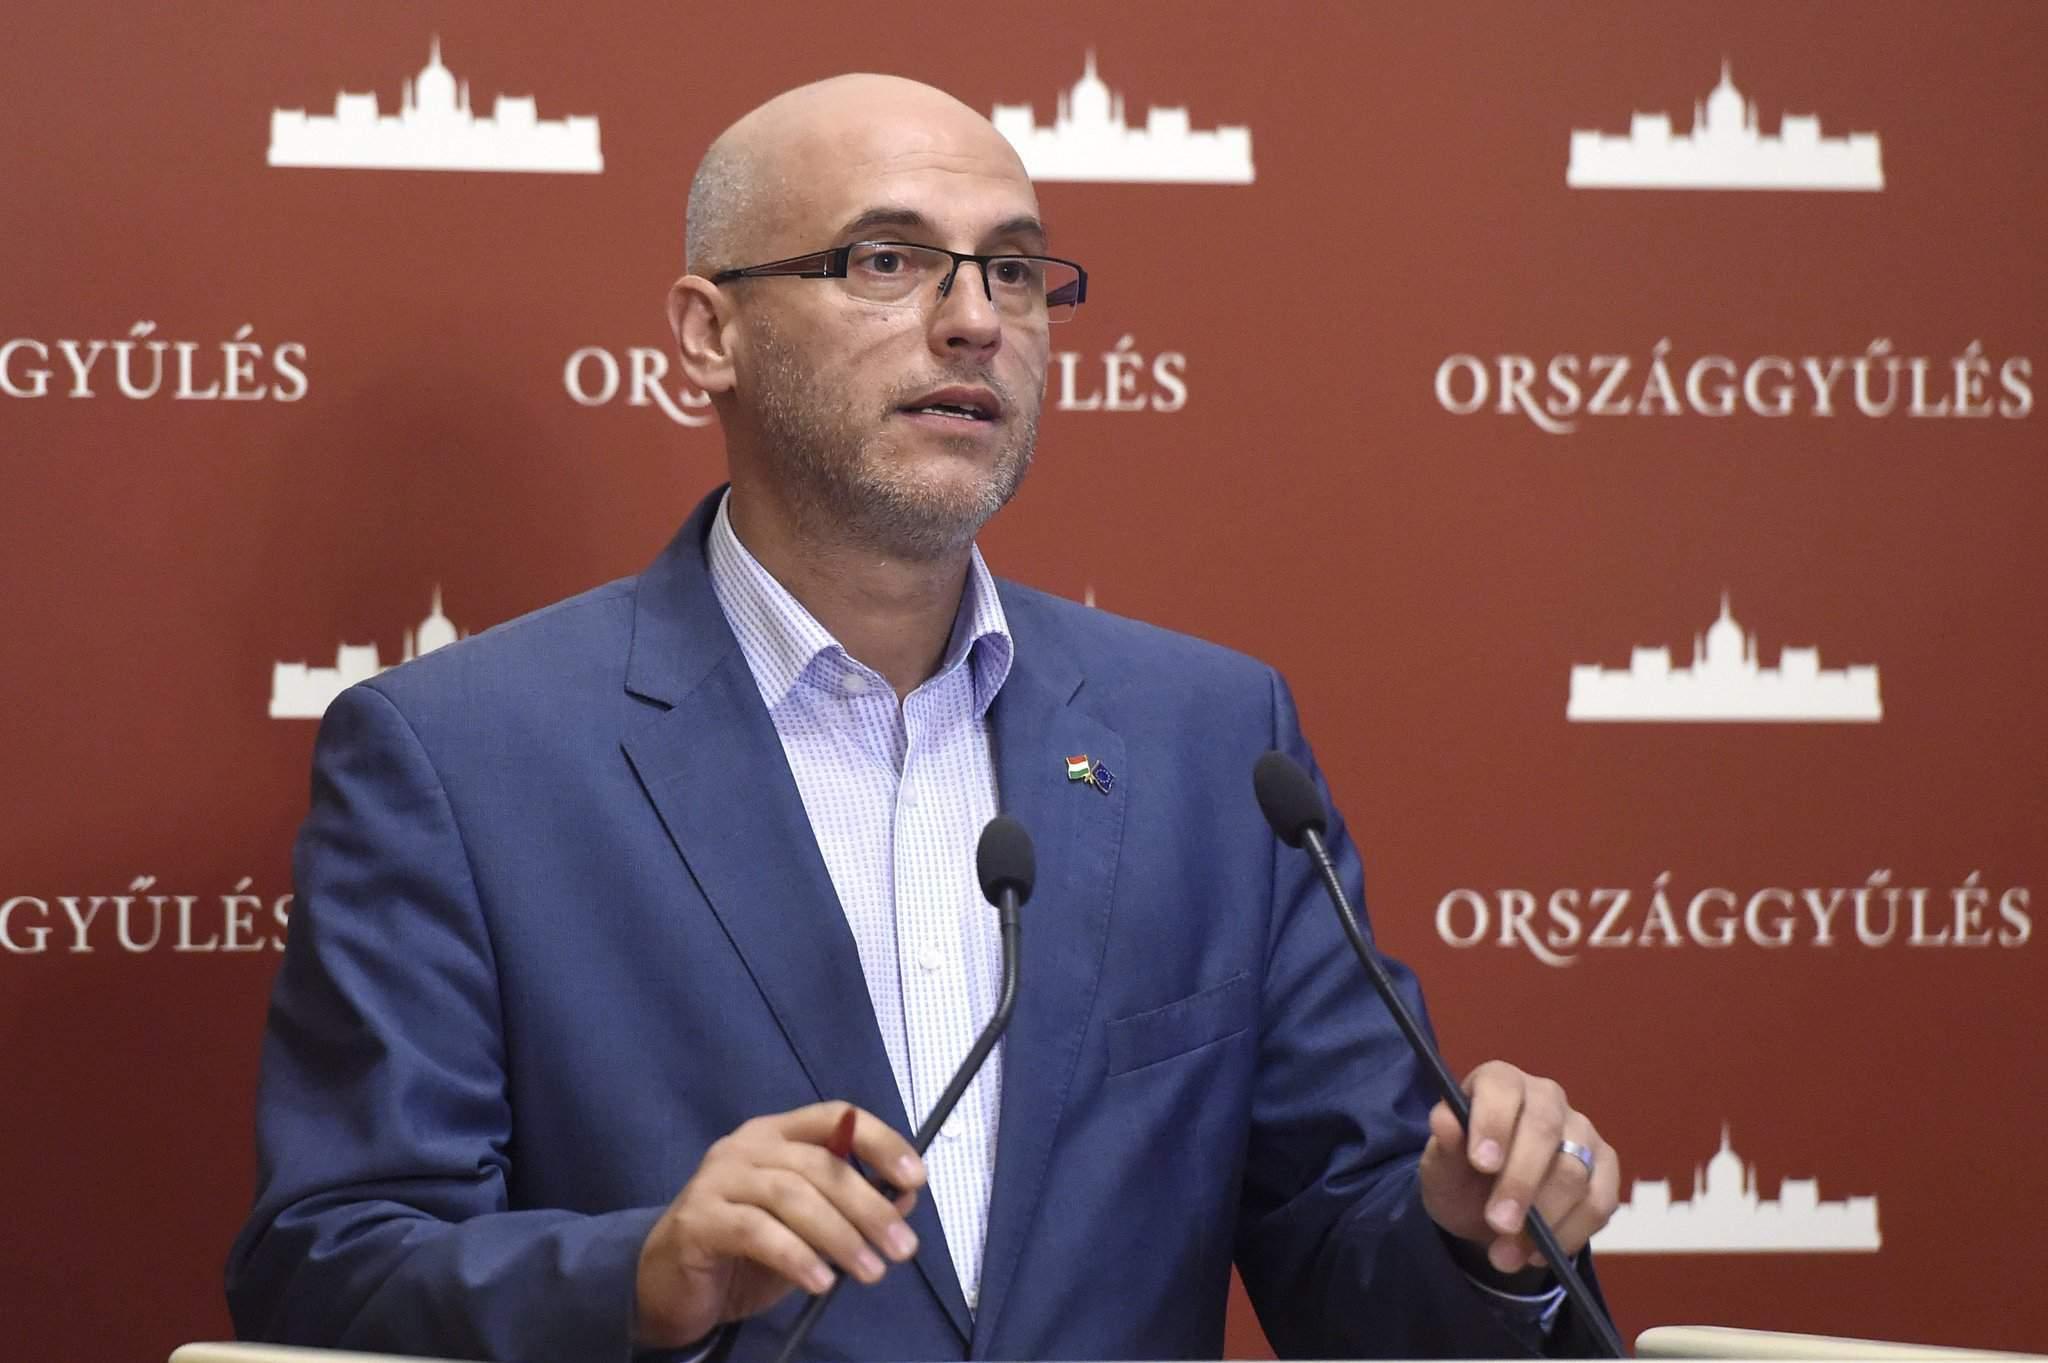 Tóbiás: Socialists aim to overshoot signature target for referendum on state land